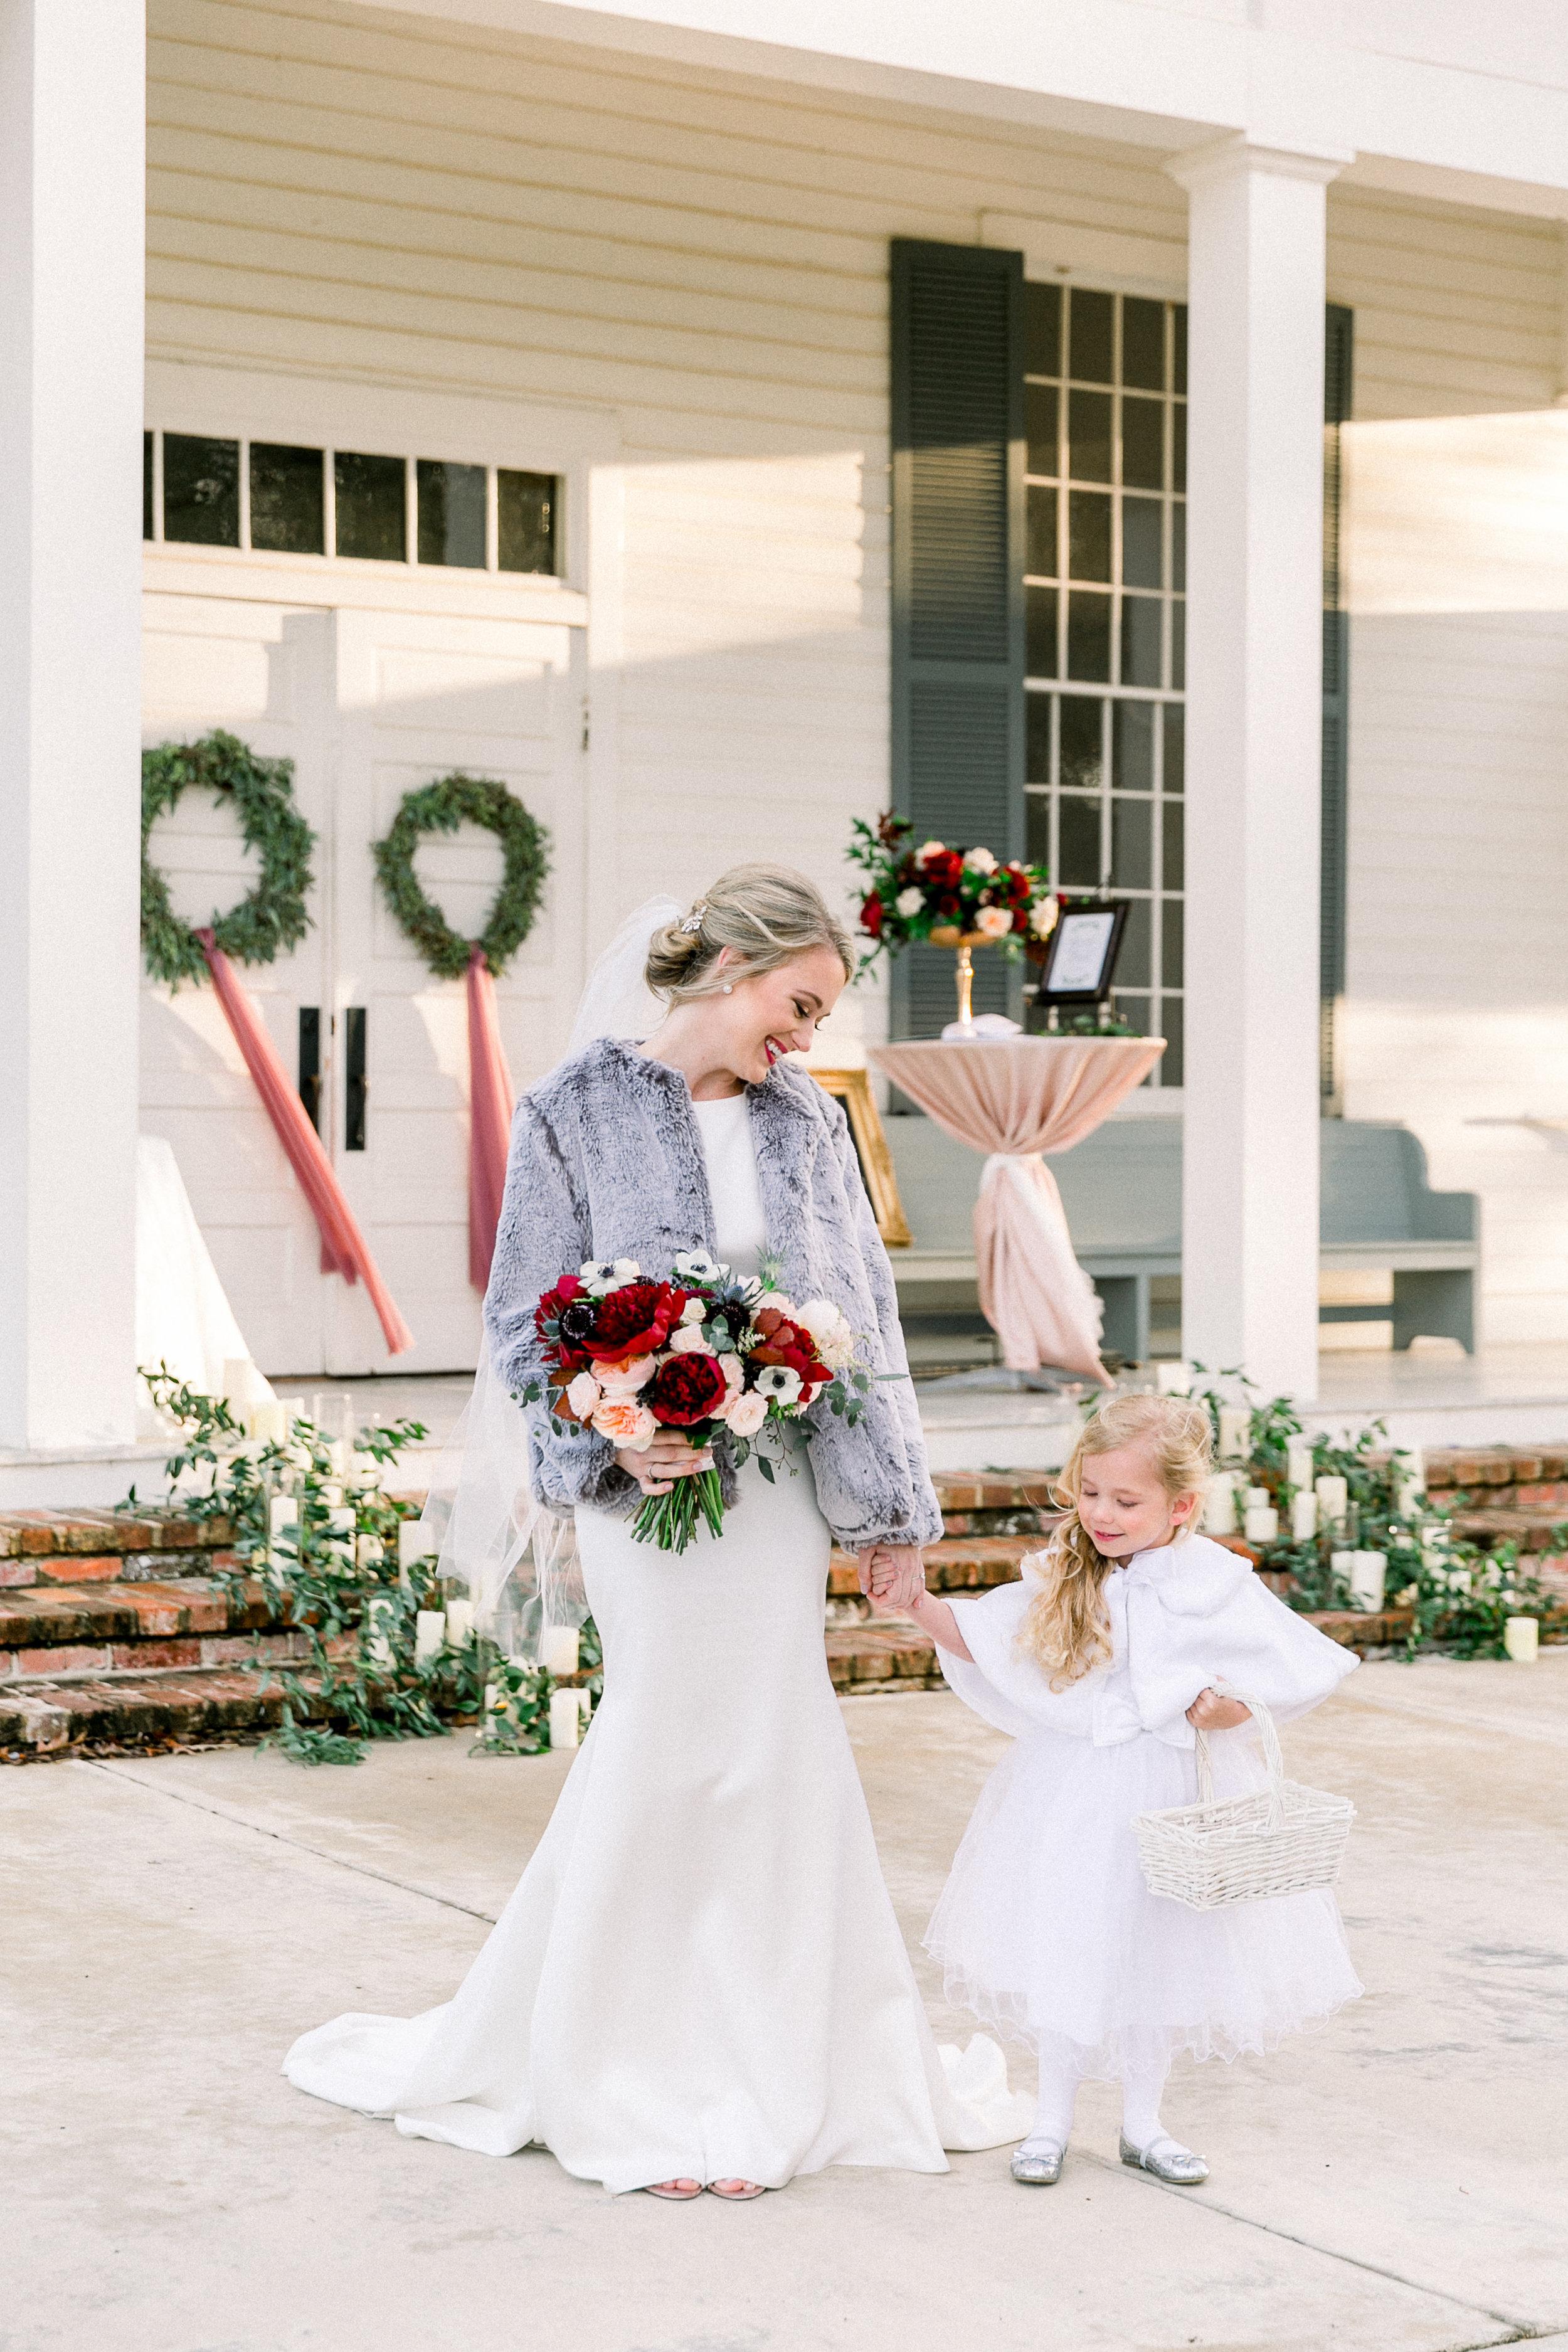 455_Rachel & Drew Wedding__Ports_Lindsay Ott Photog_2018.jpg